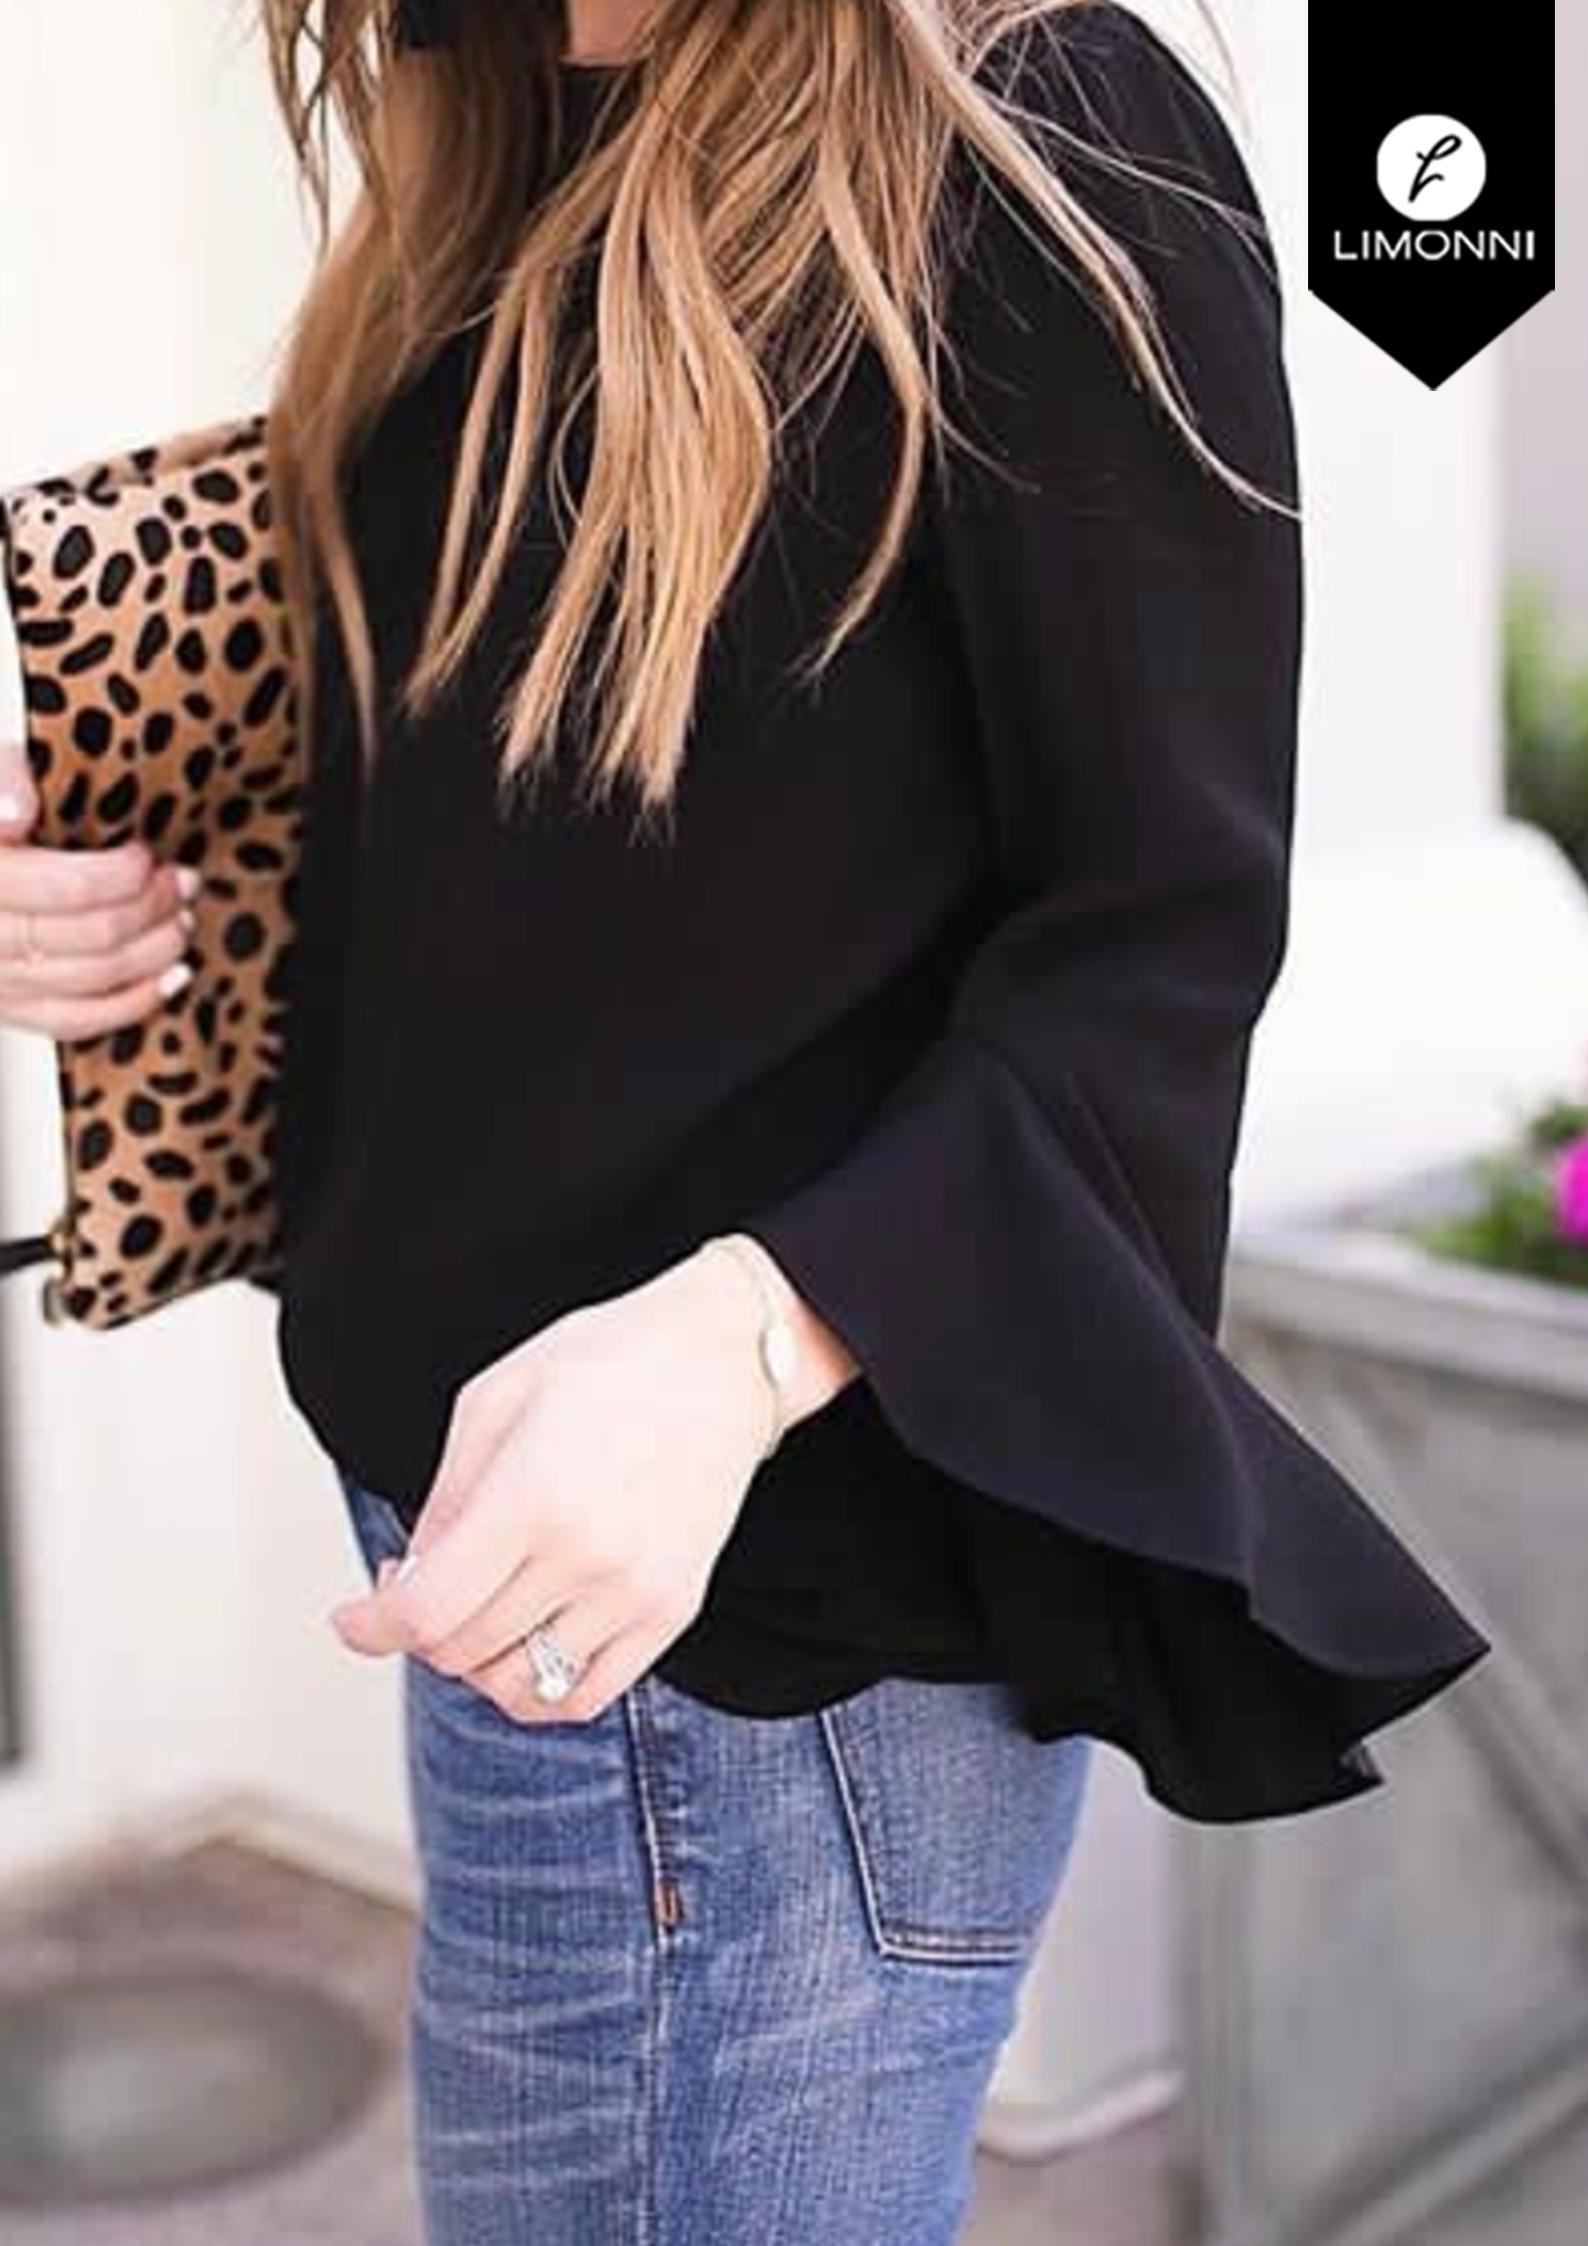 Blusas para mujer Limonni Bennett LI1281 Casuales